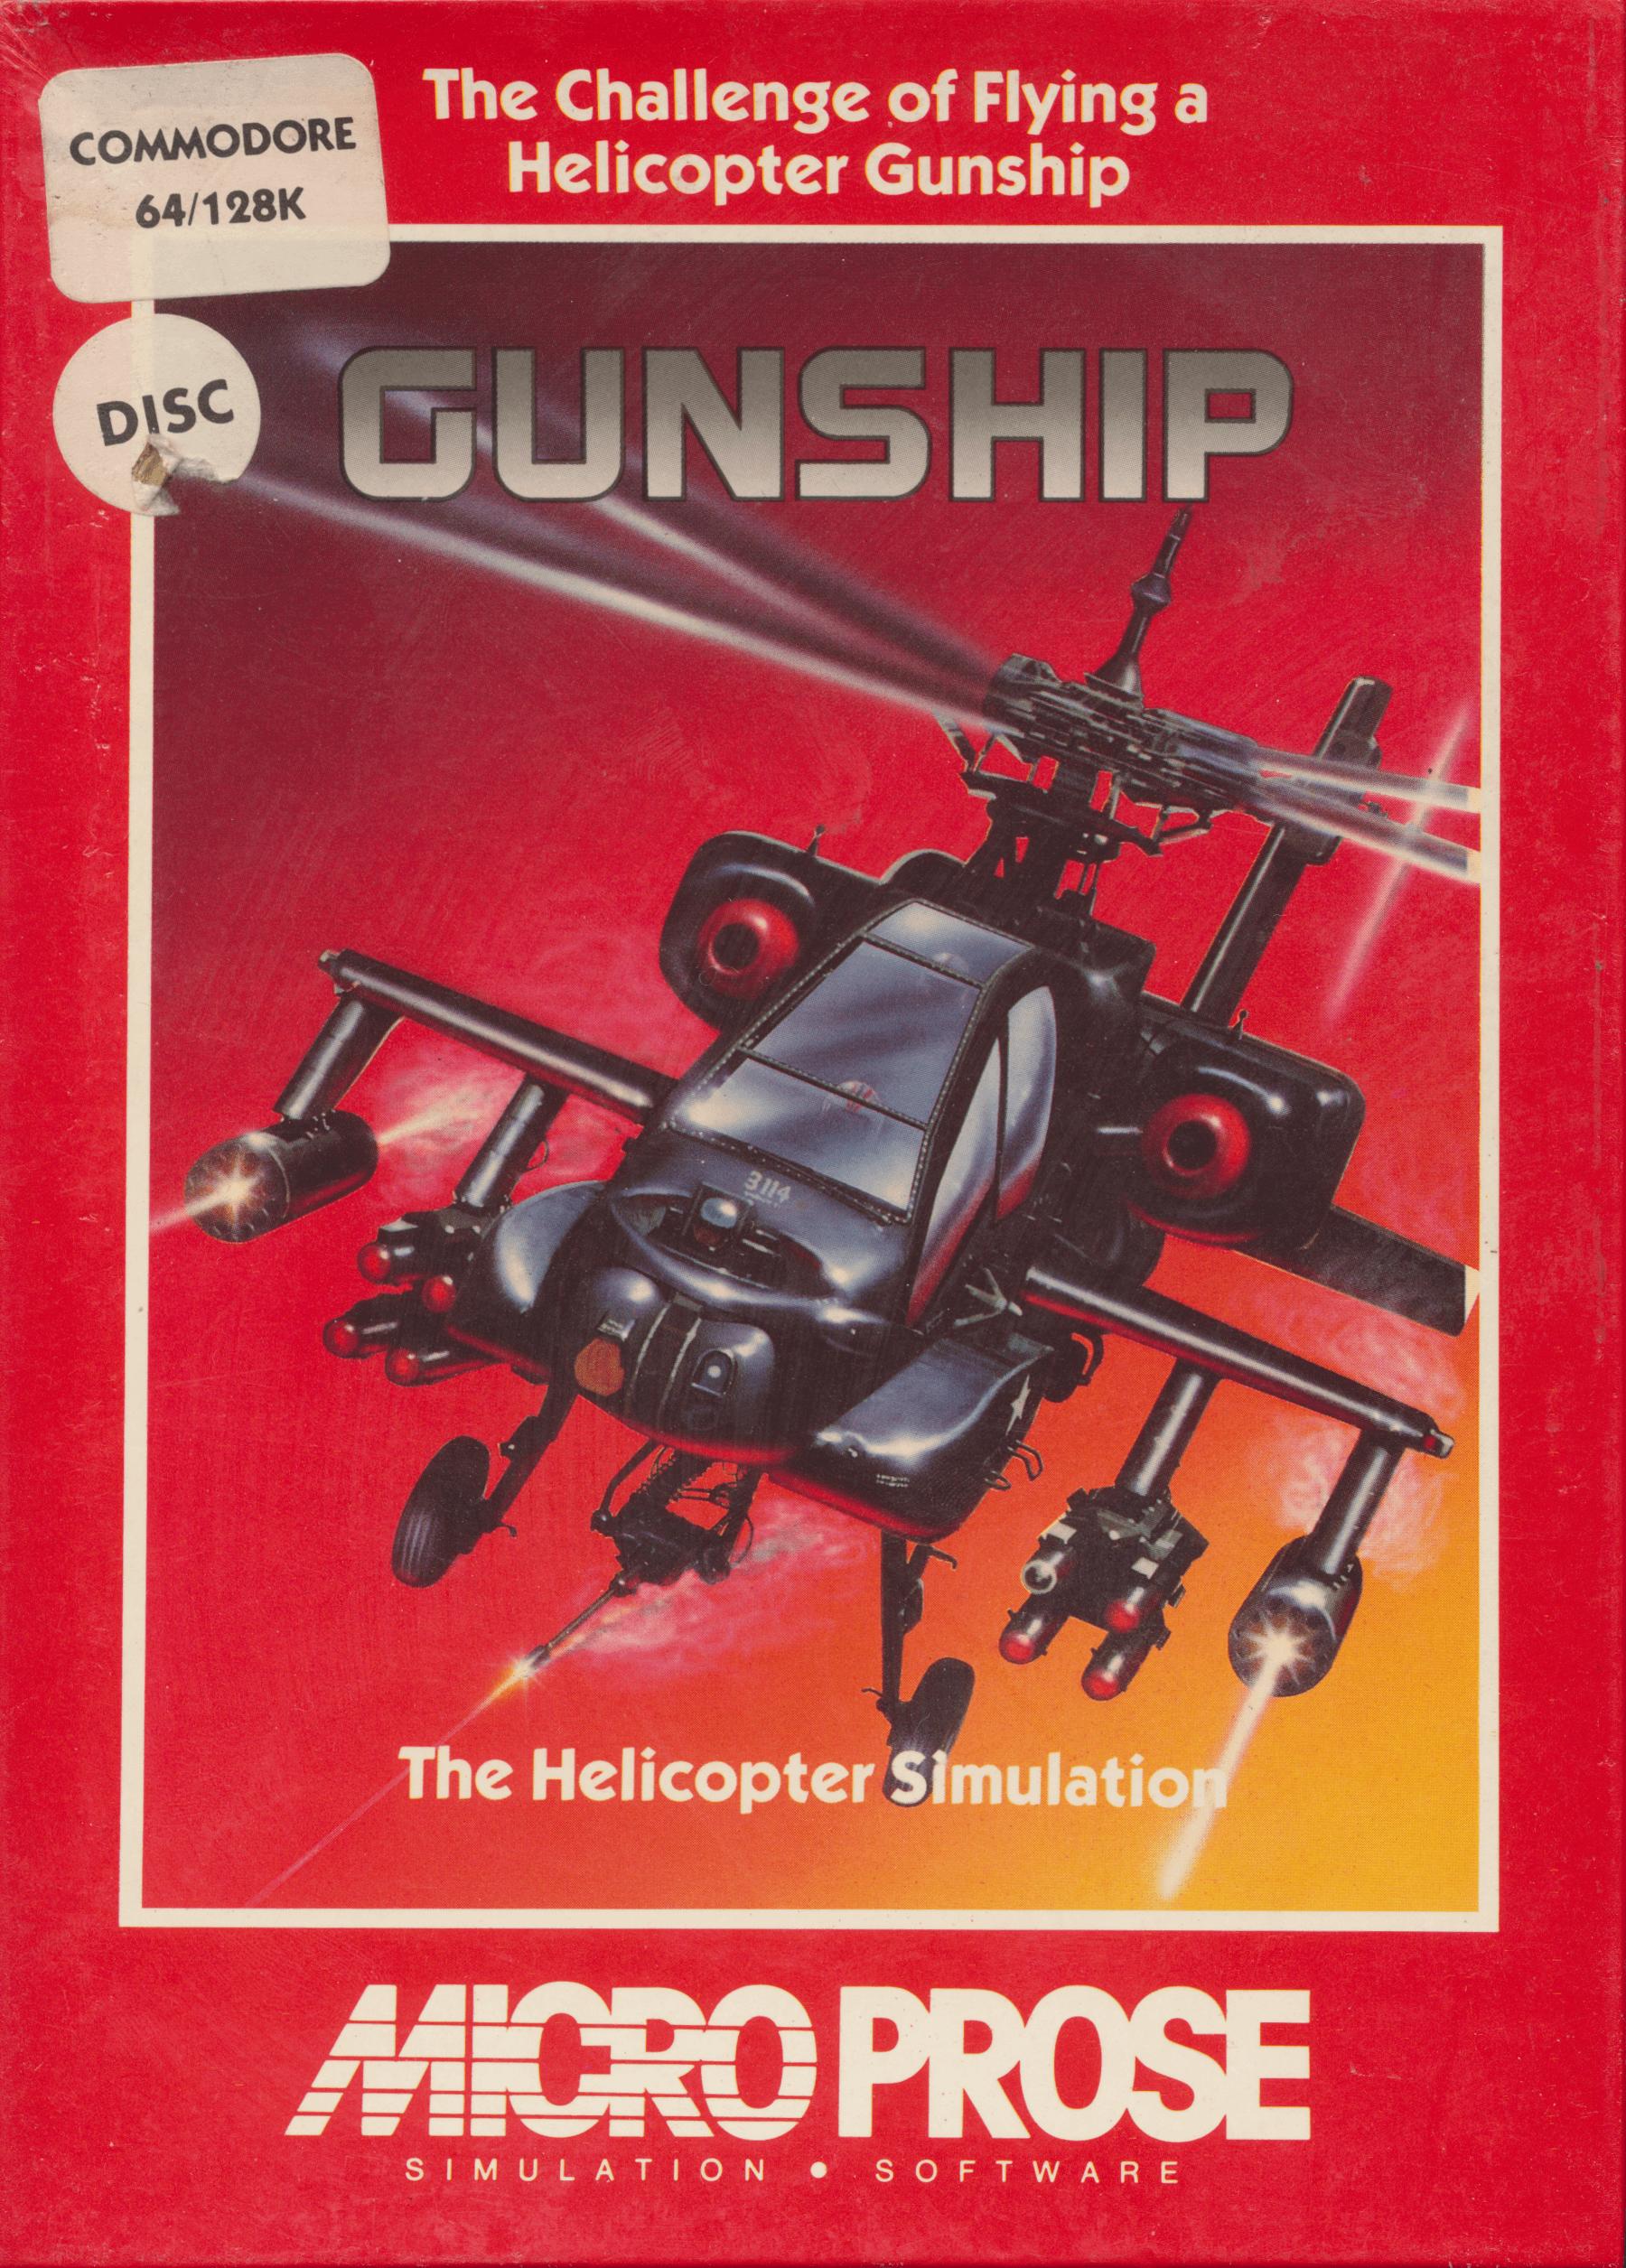 Gunship by Microprose - Box Art